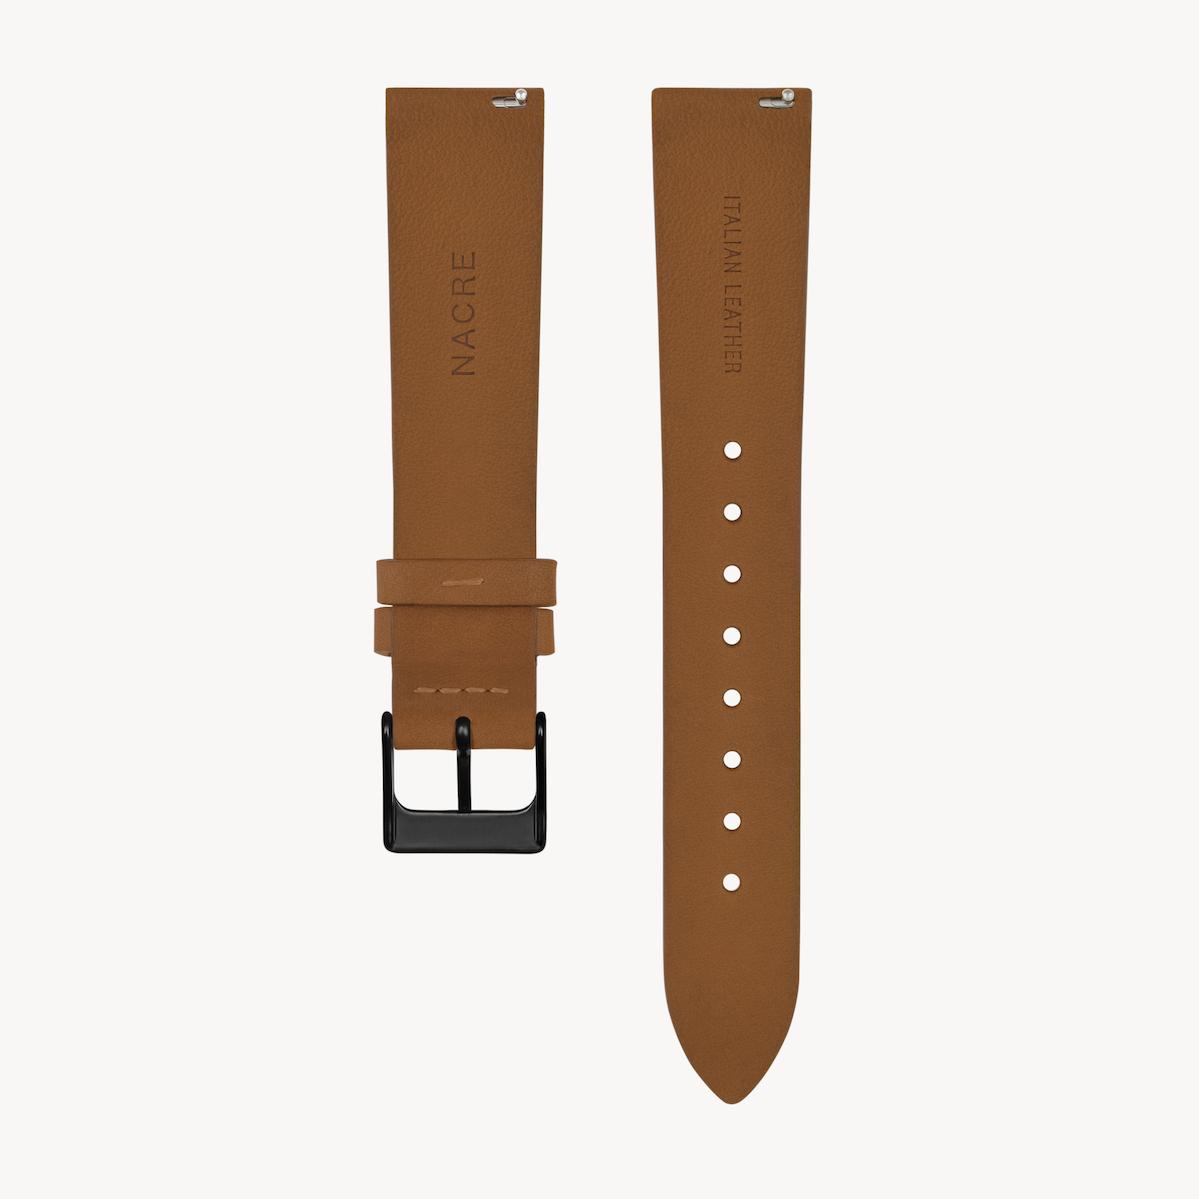 Strap - Italian Leather - Saddle Leather - Matte Black